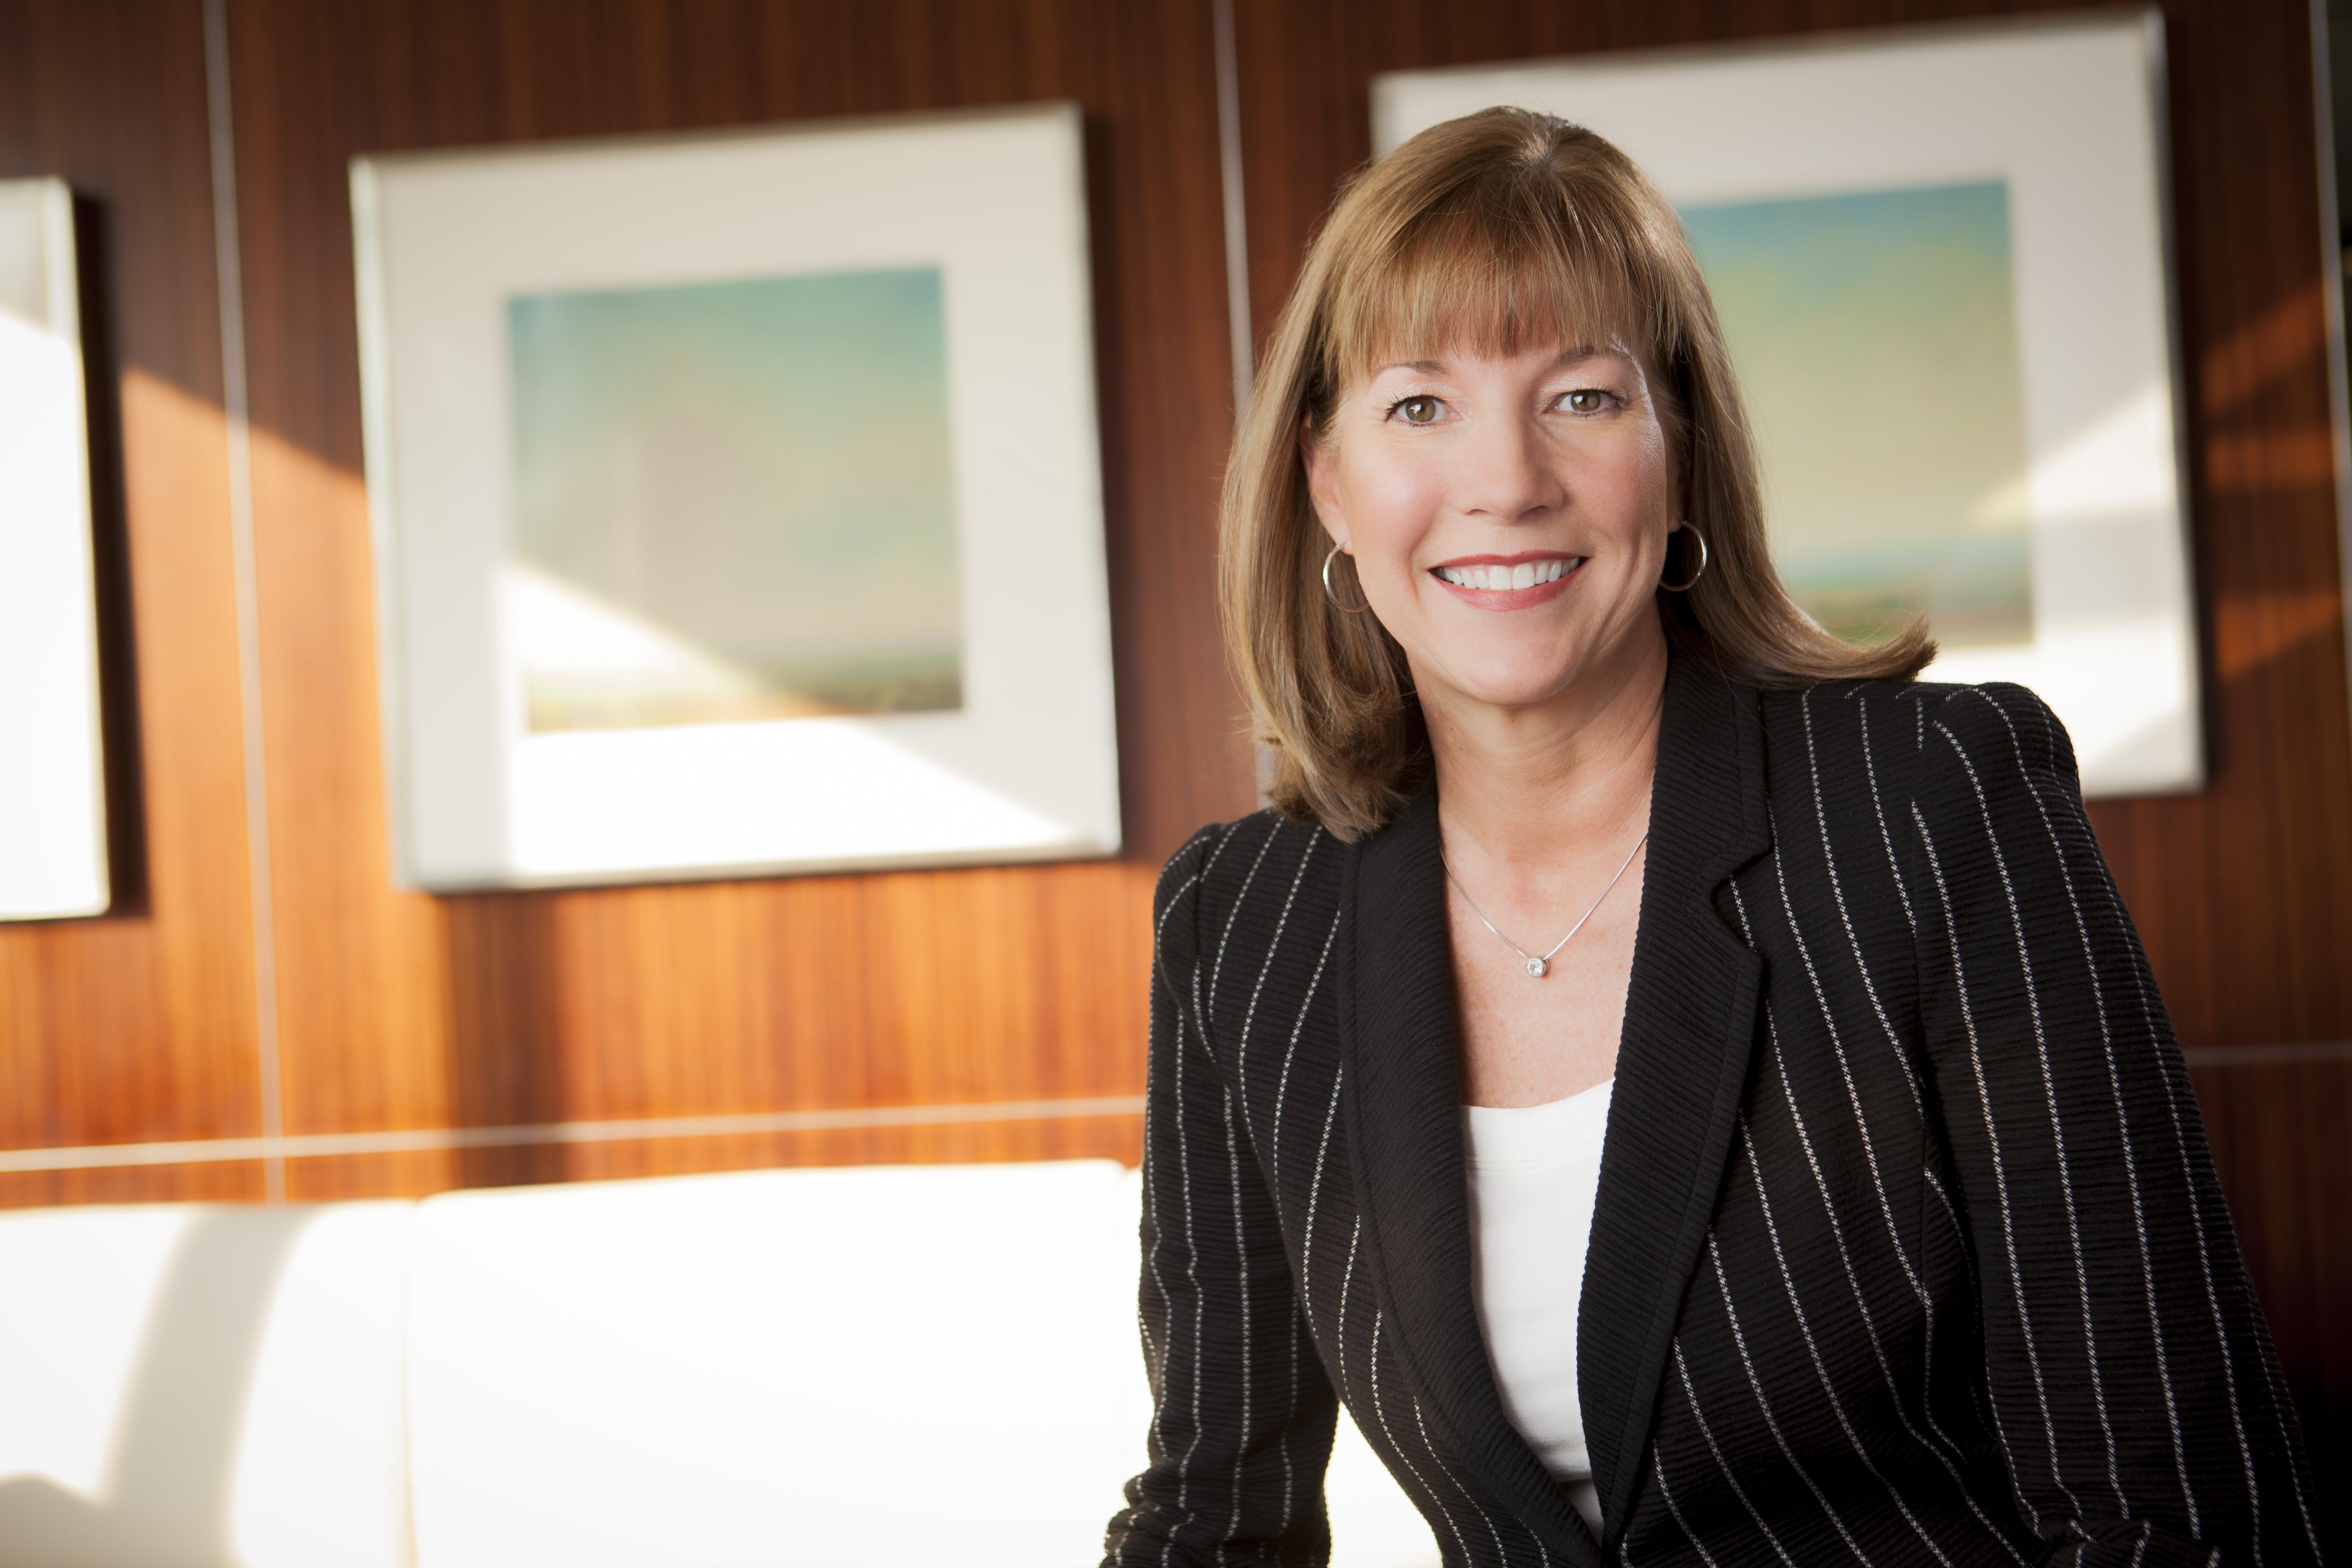 Lynne Doughtie, Vice Chair - Advisory, KMPG